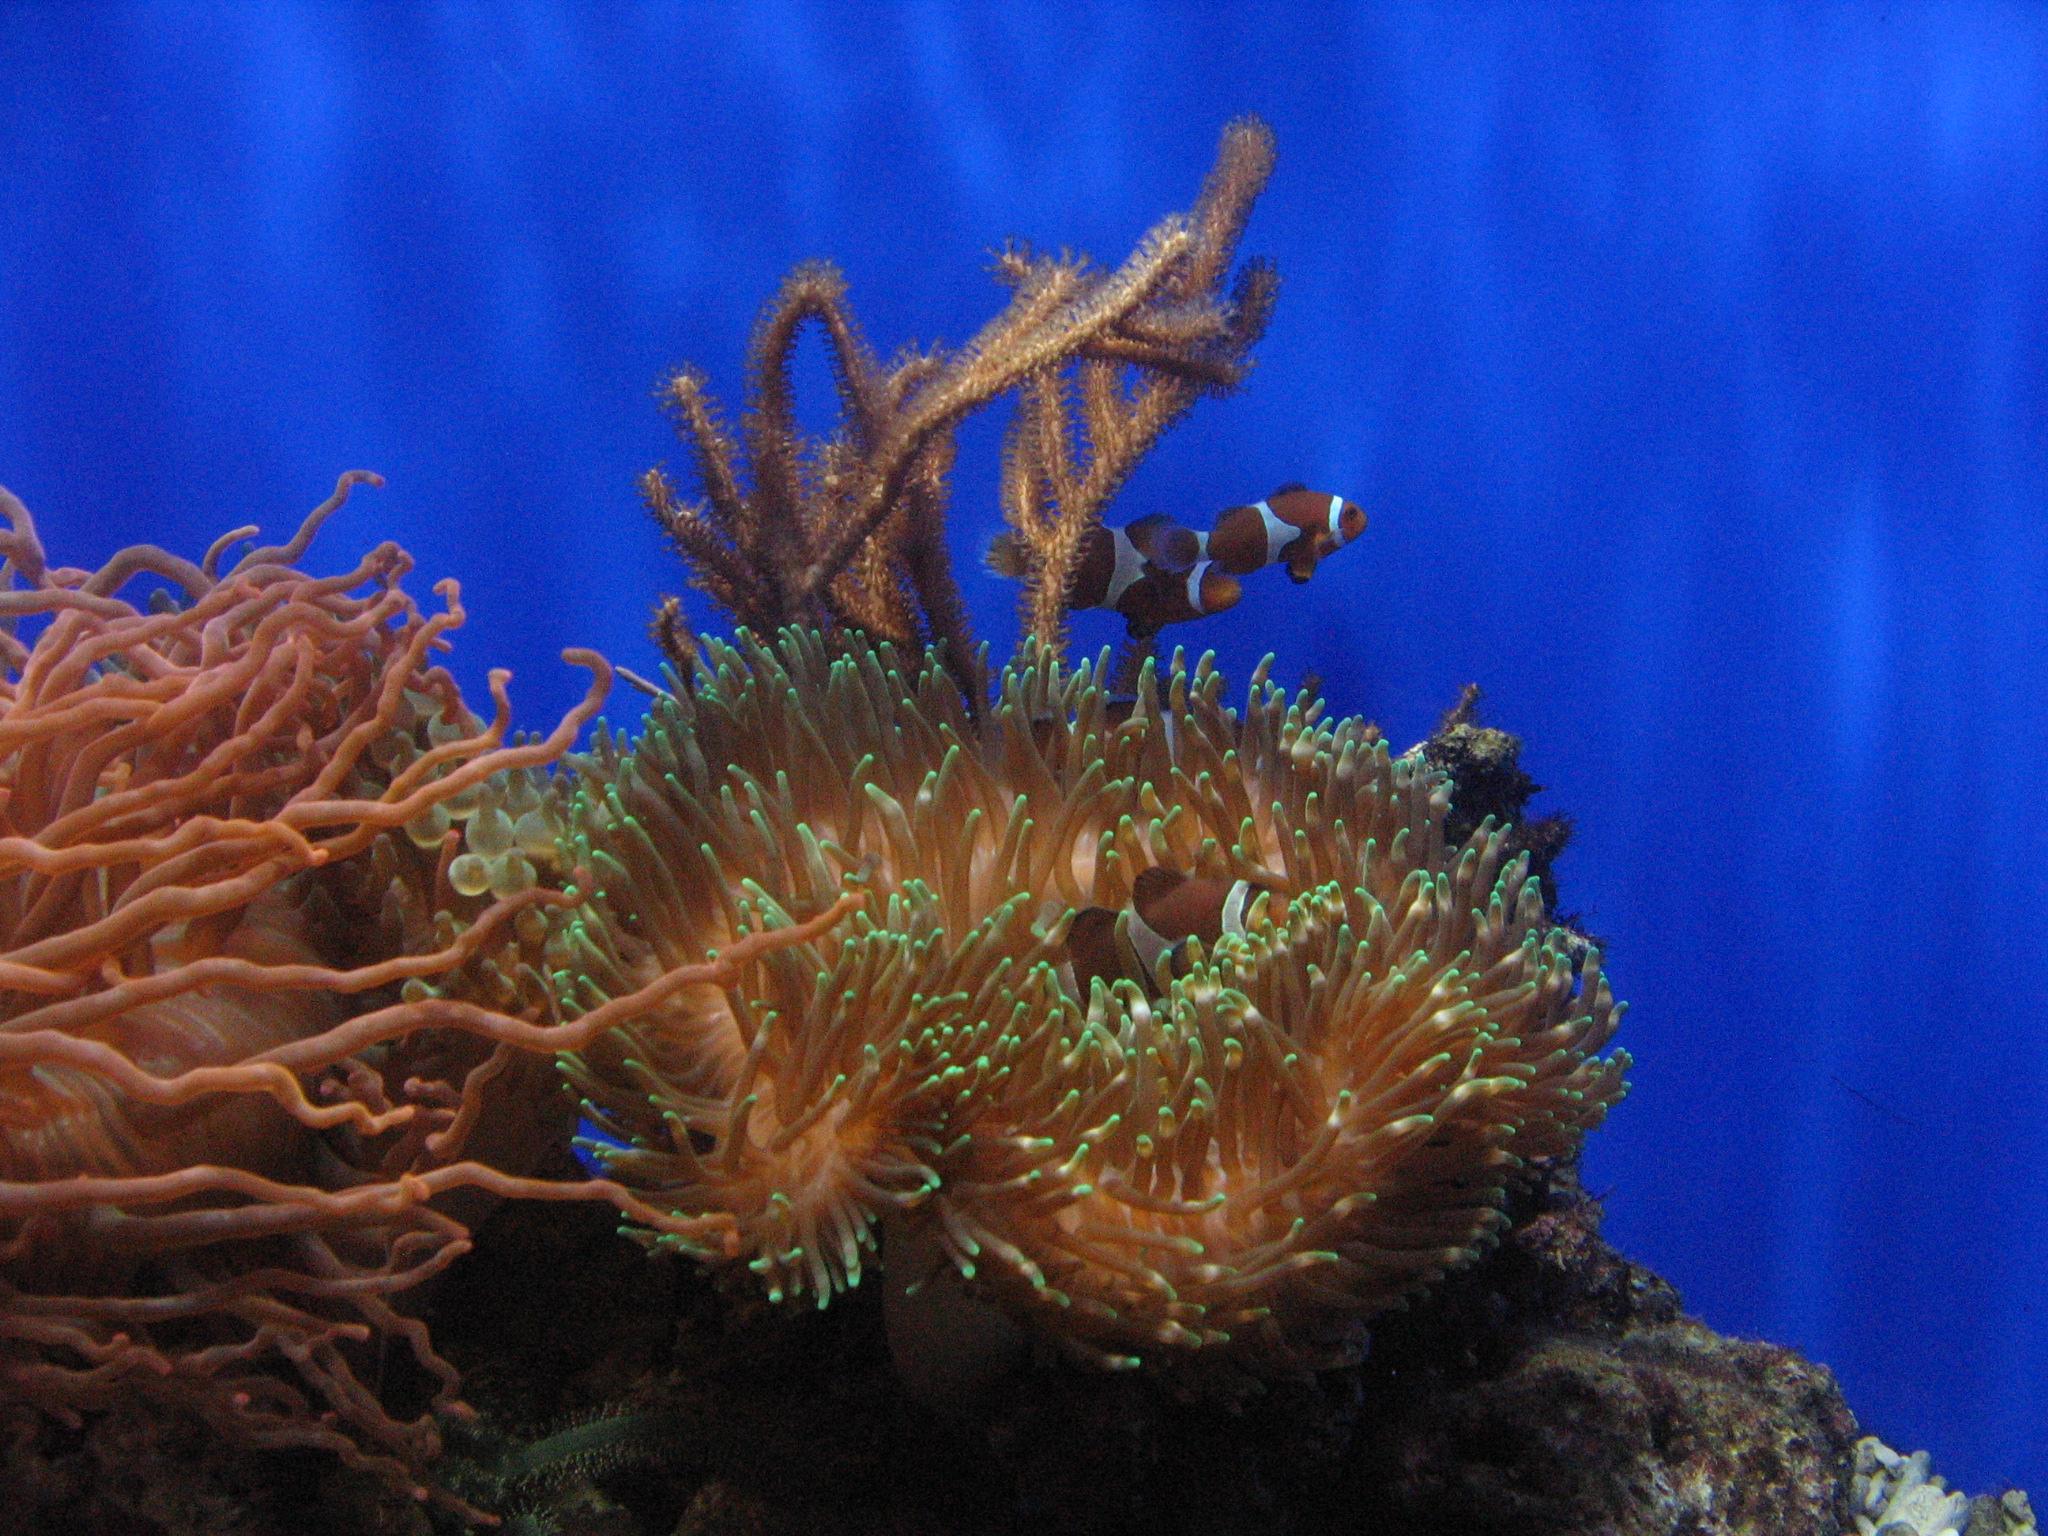 Underwater World, Bspo06, Clown, Coral, Fish, HQ Photo